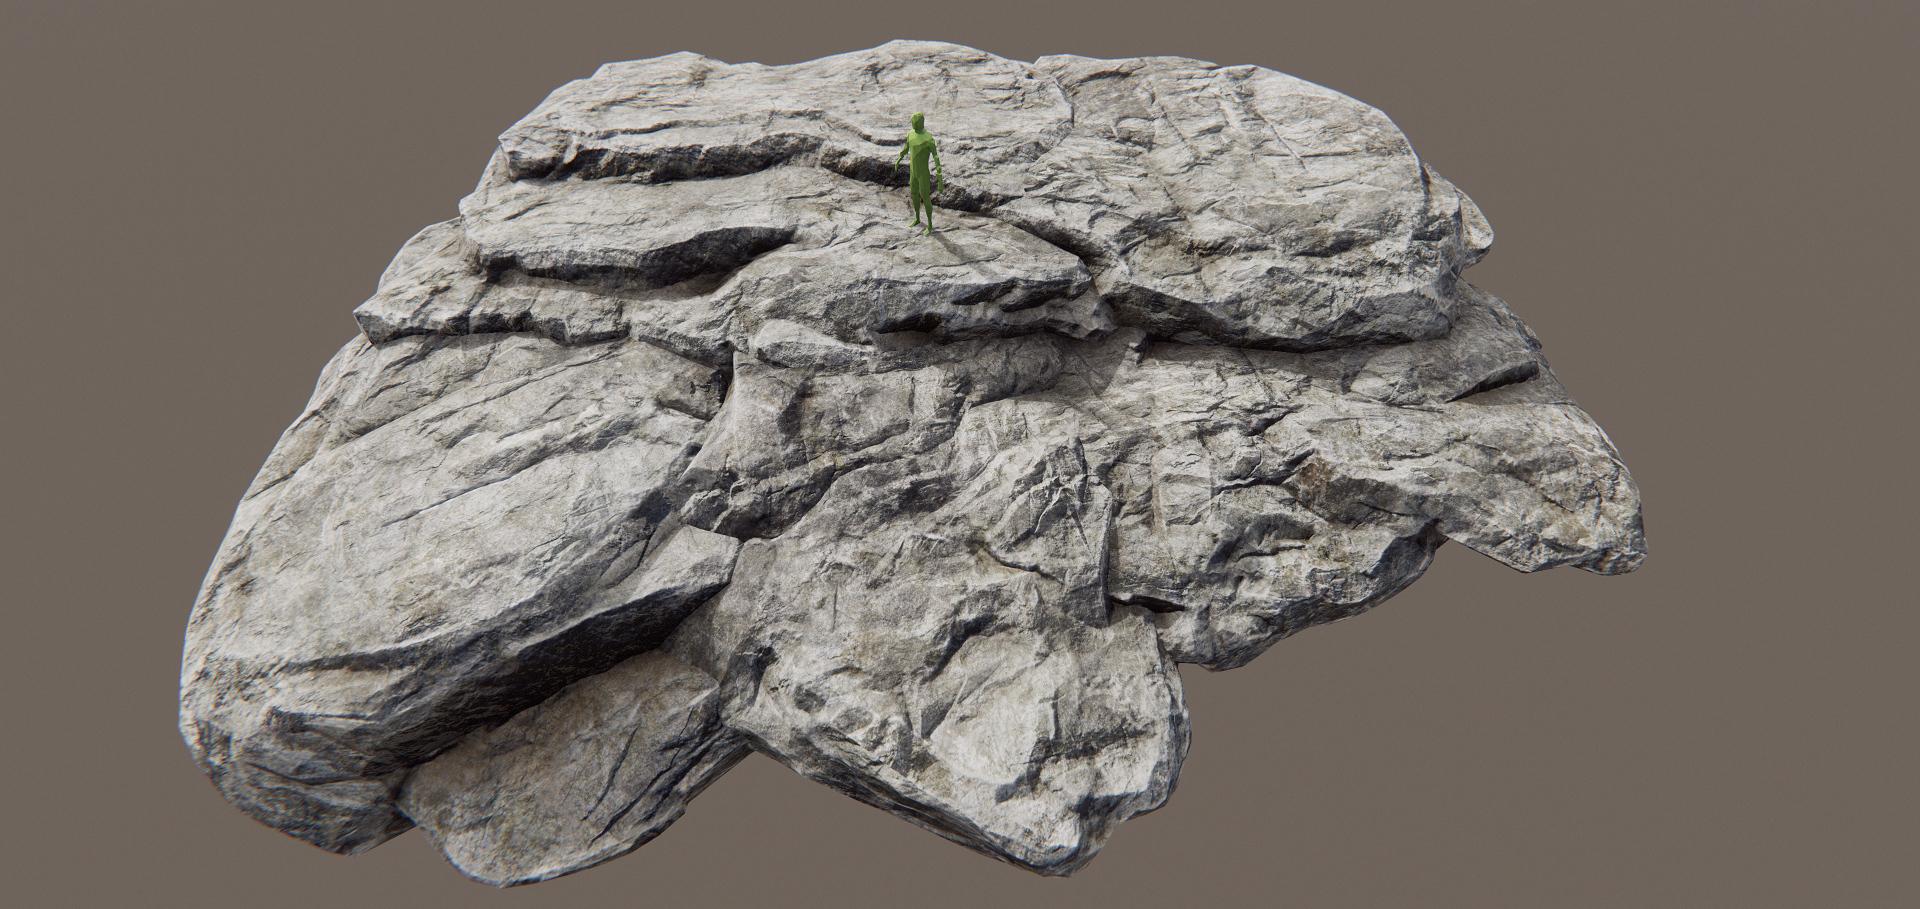 RocksMerged_01.jpg